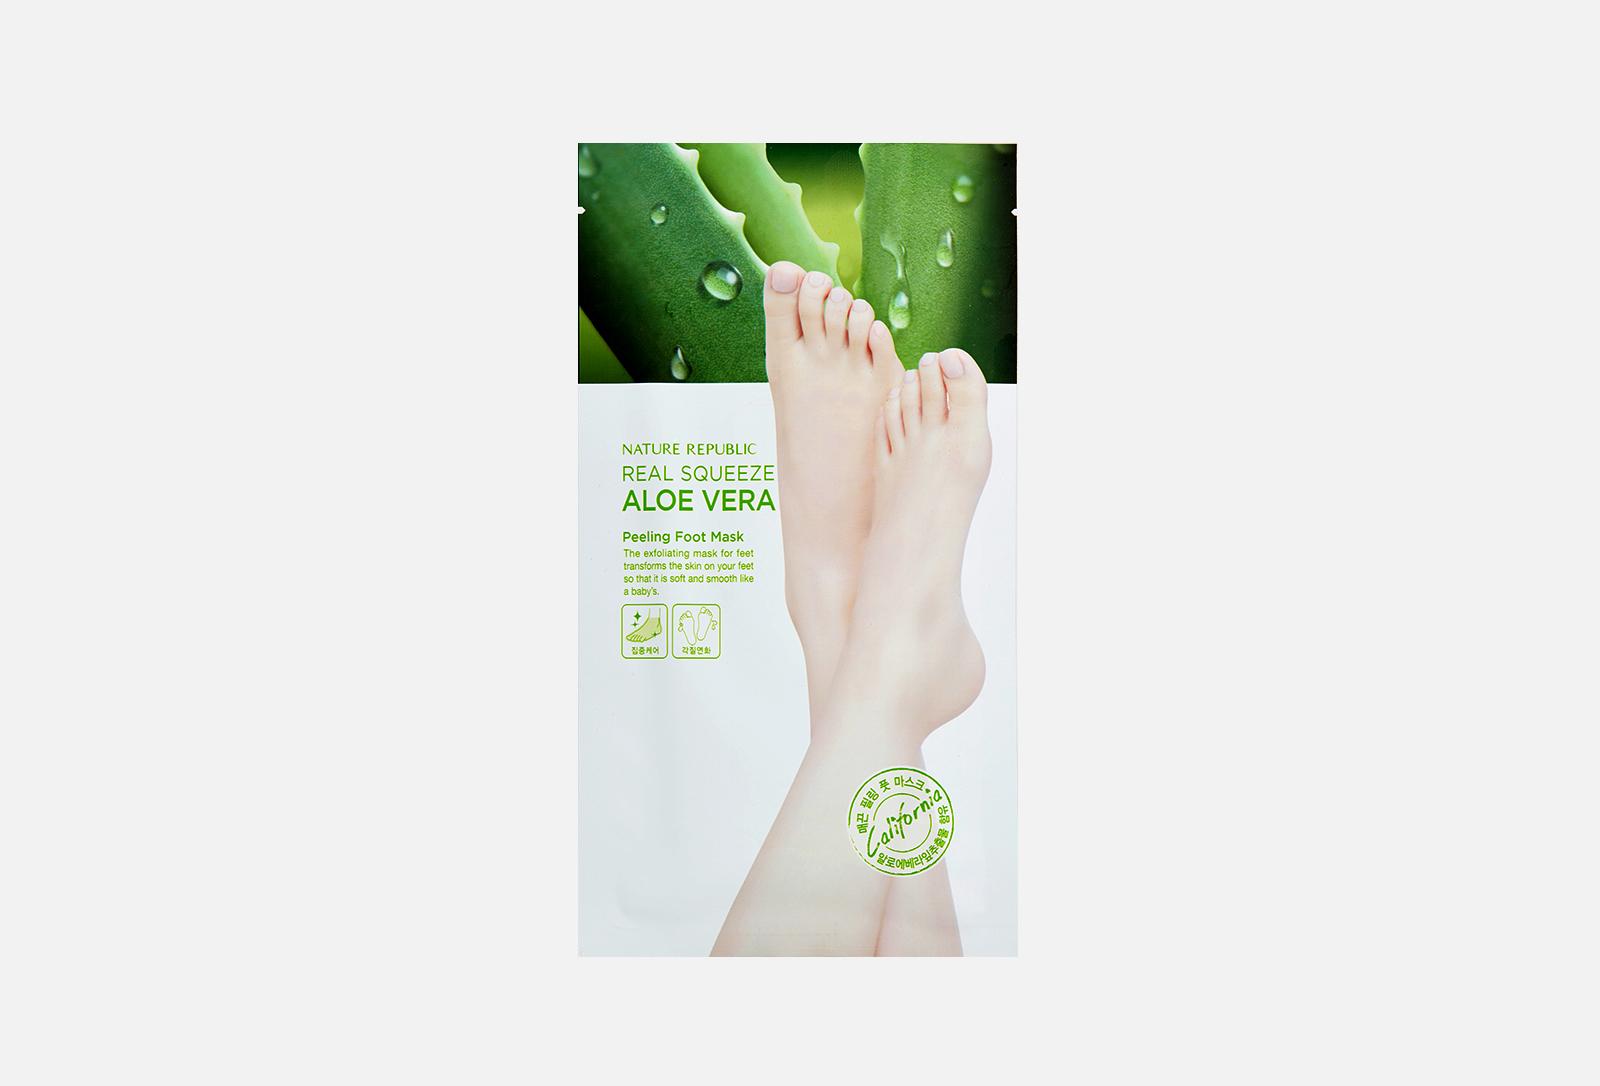 Real Squeeze Aloe Vera Peeling Foot Mask